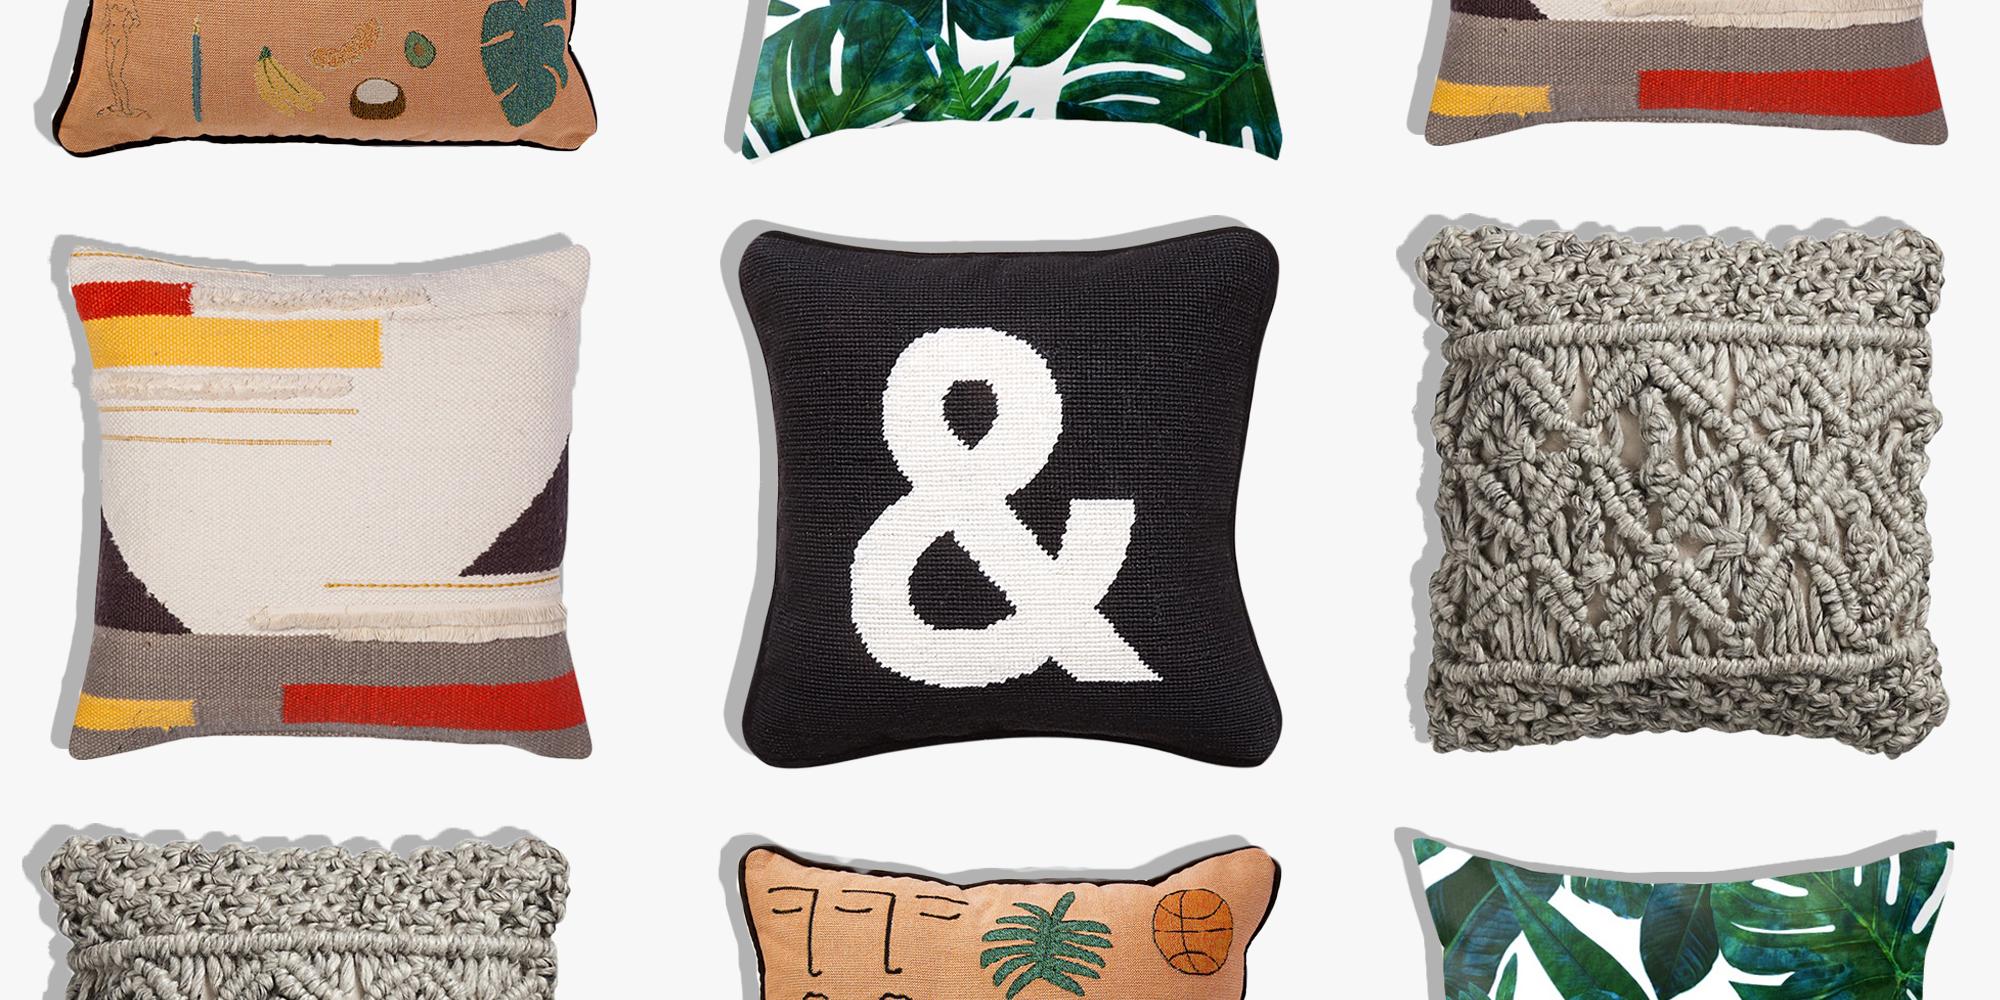 Best Decorative Throw Pillows : 13 Best Decorative Throw Pillows in 2018 - Comfy Couch Throw Pillows